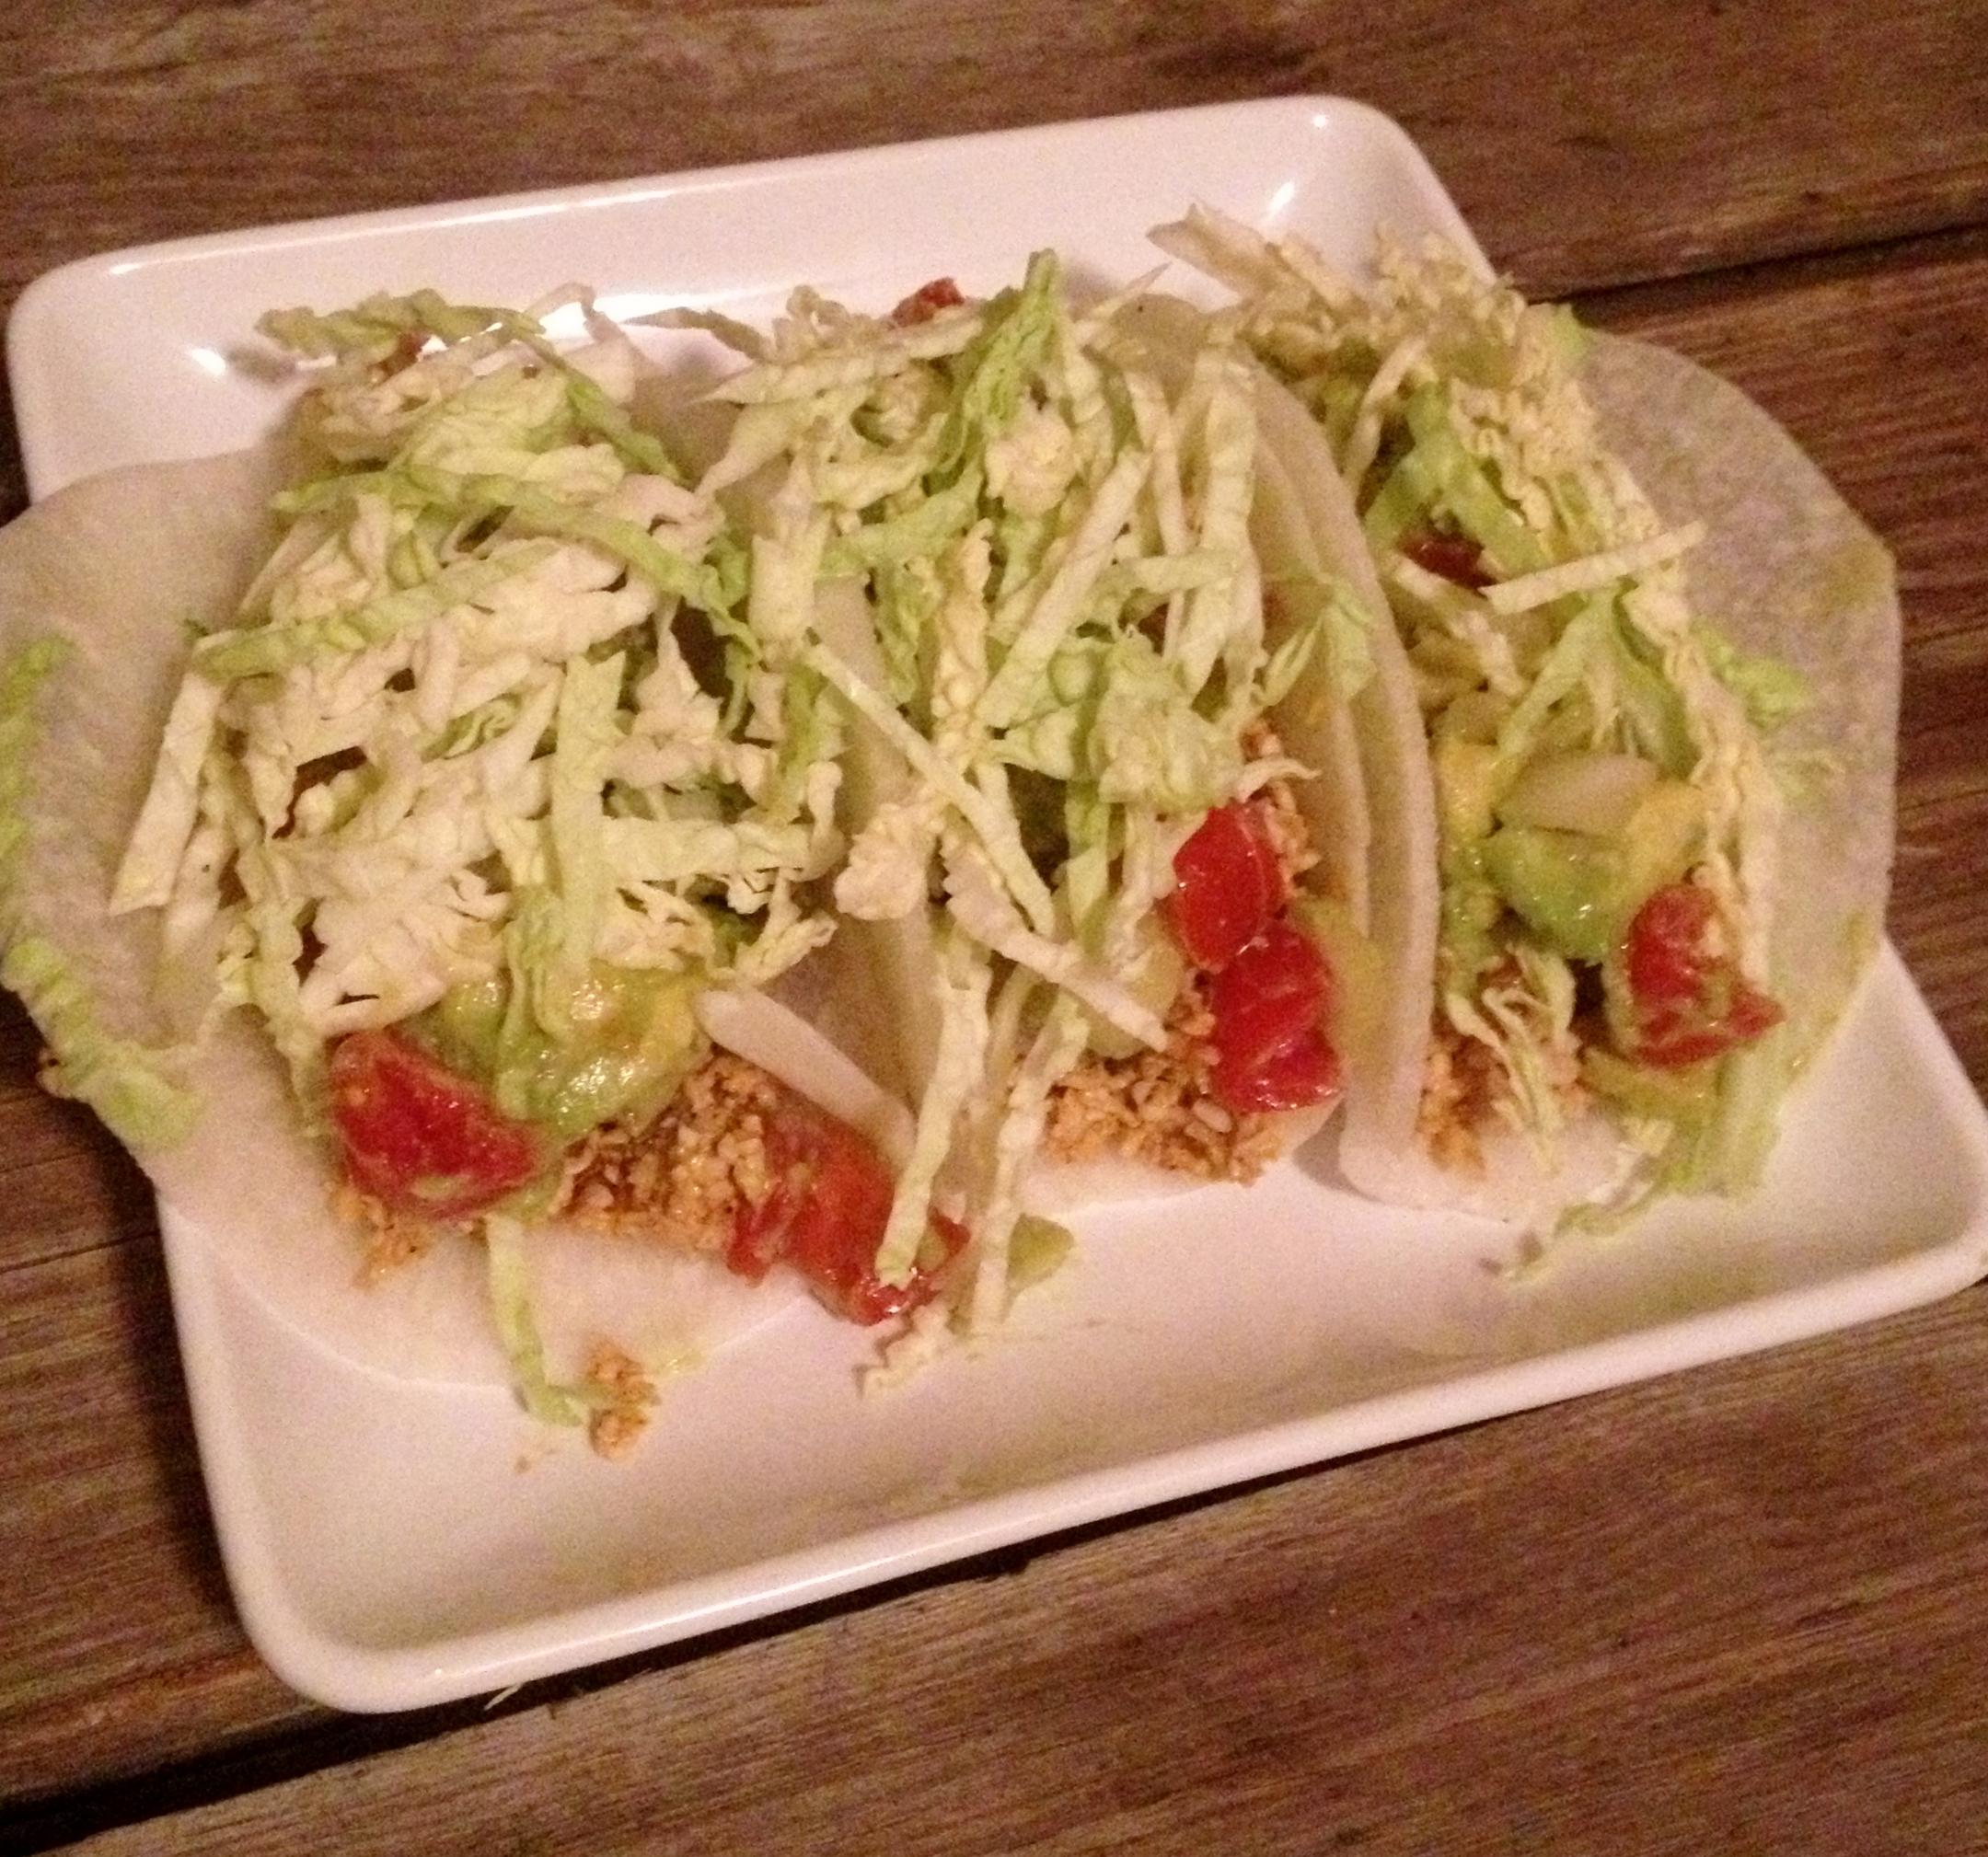 Sunny Tacos, gluten-free, raw vegan, nut-free taco filling